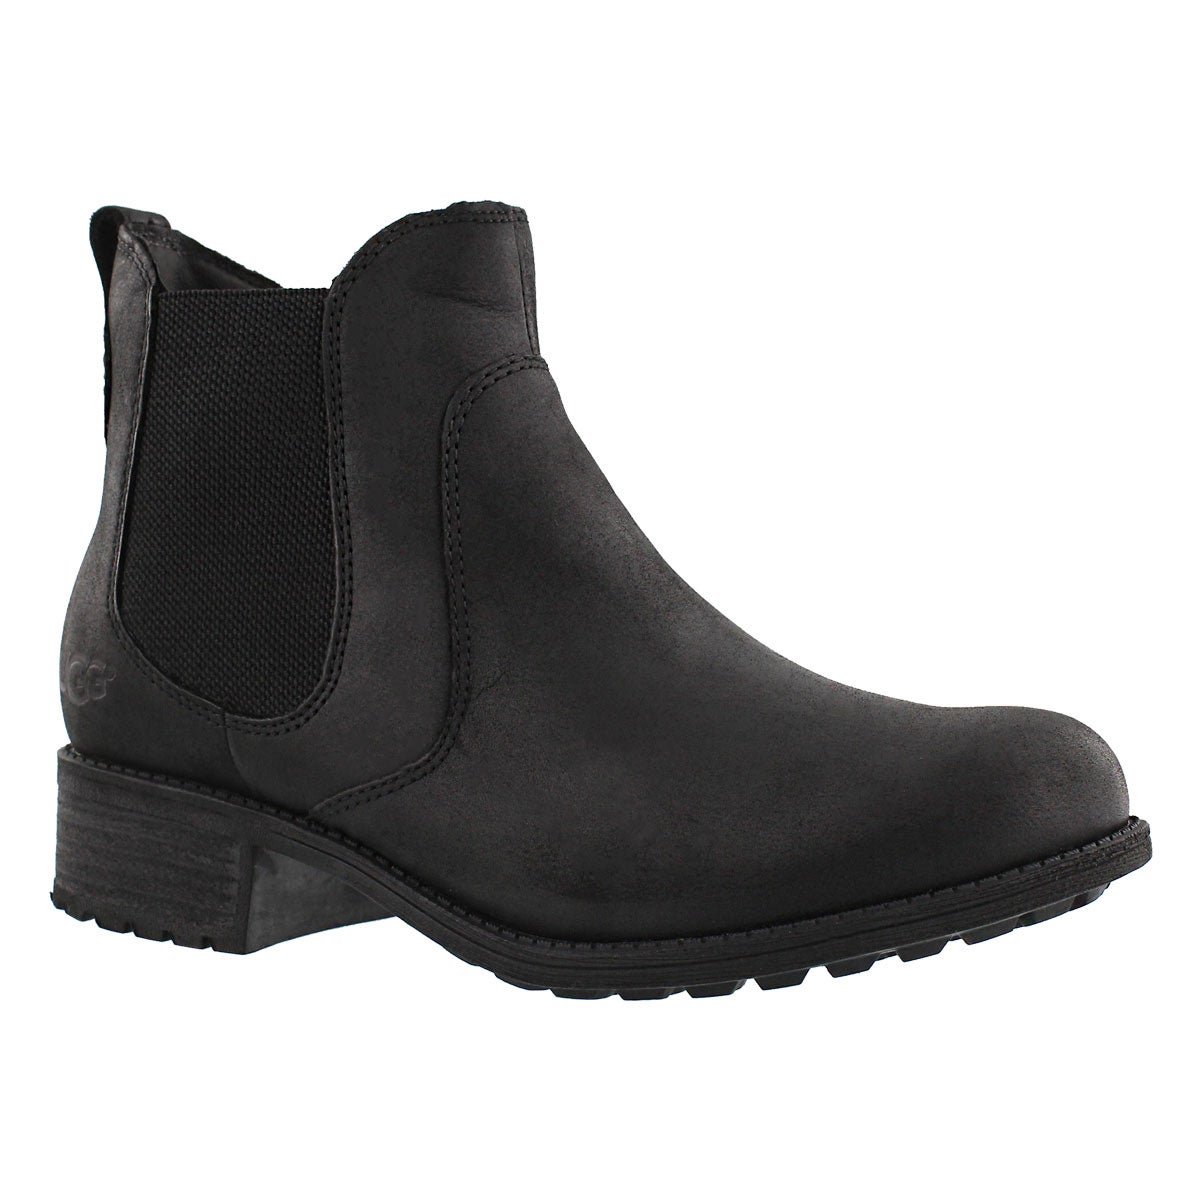 Lds Bonham black chelsea boot